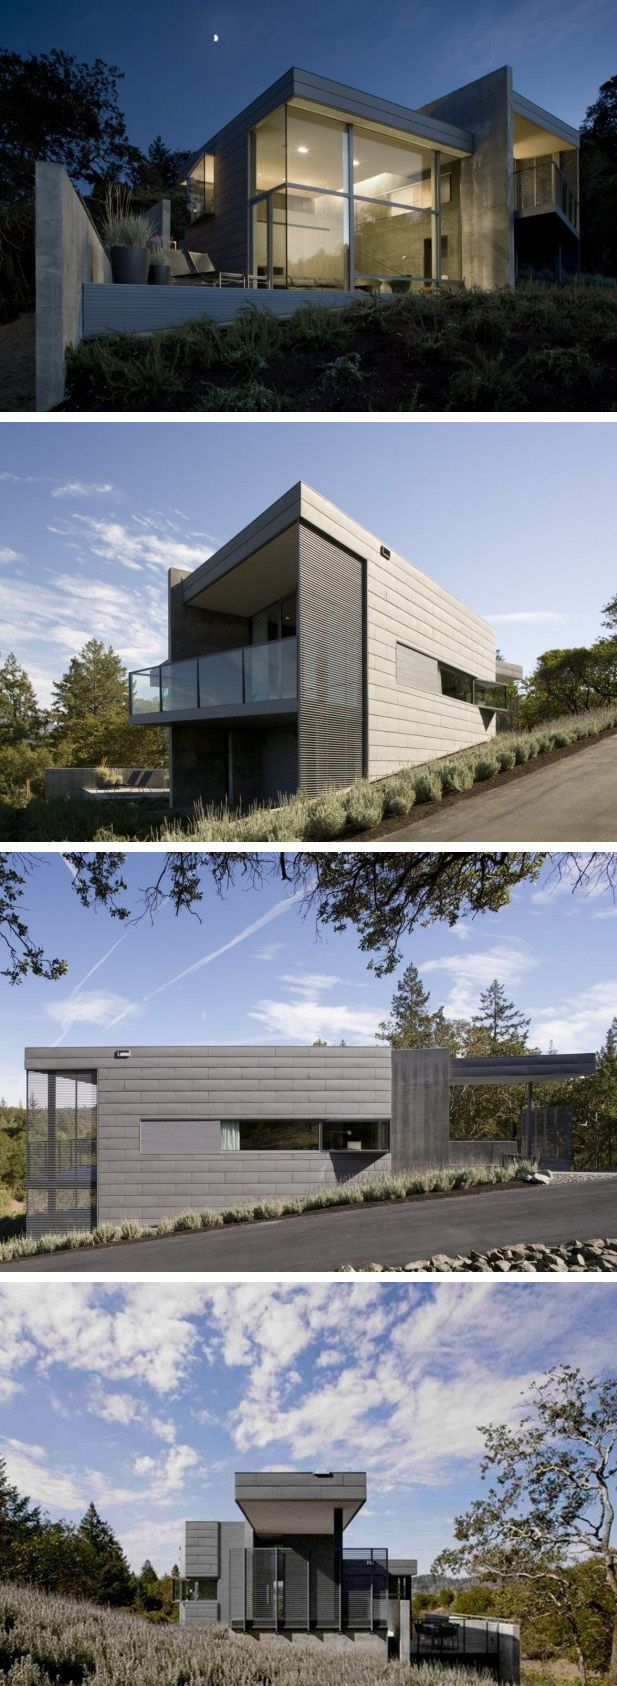 Cooper Joseph Studio Designed This House In The Dry Creek